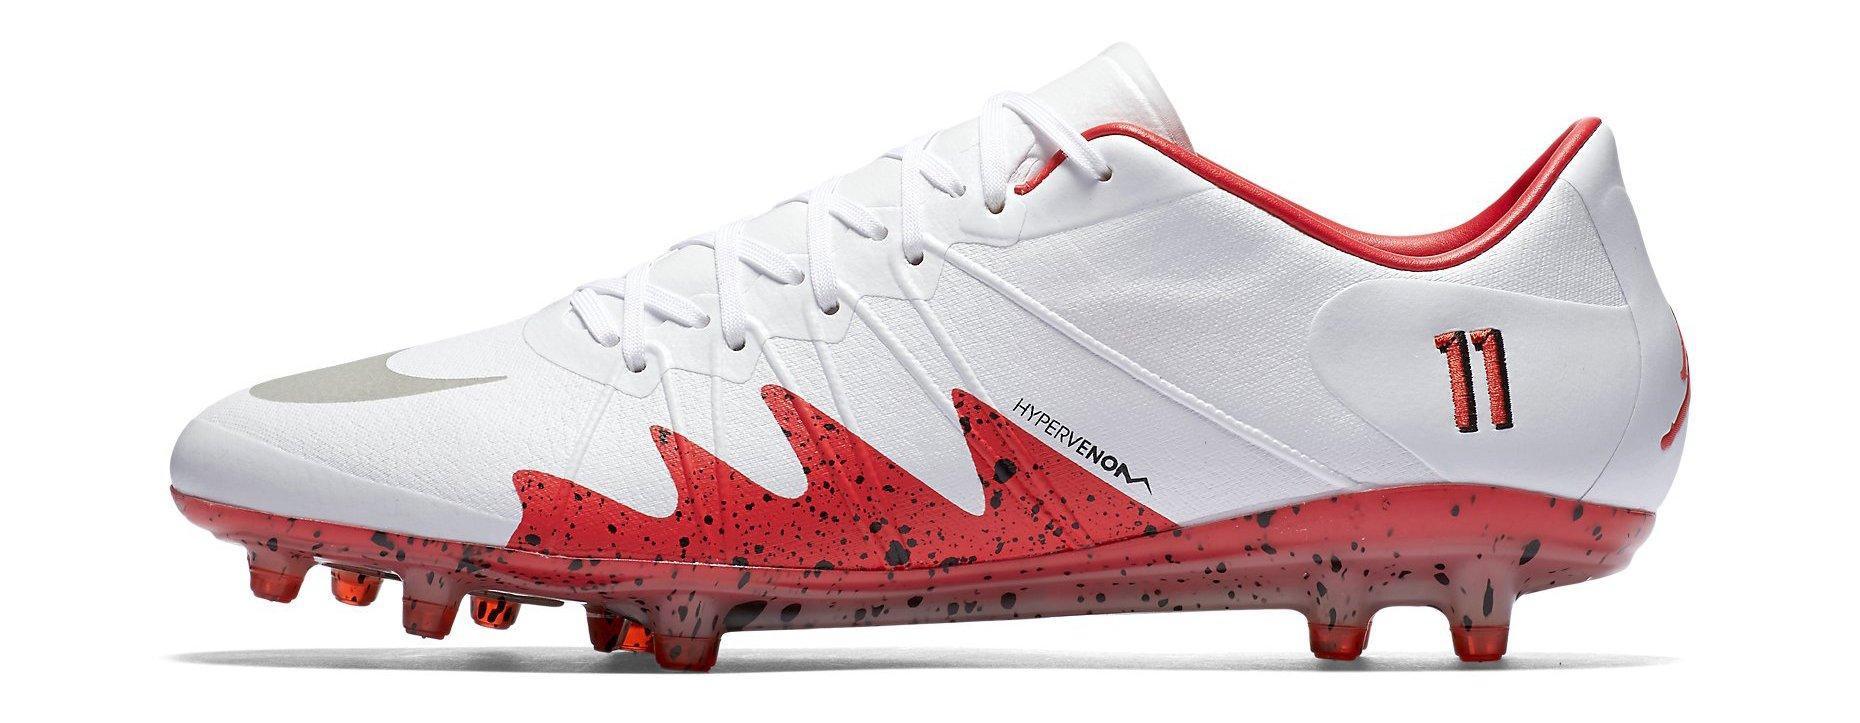 Kopačky Nike Hypervenom Phinish NJR x Jordan FG